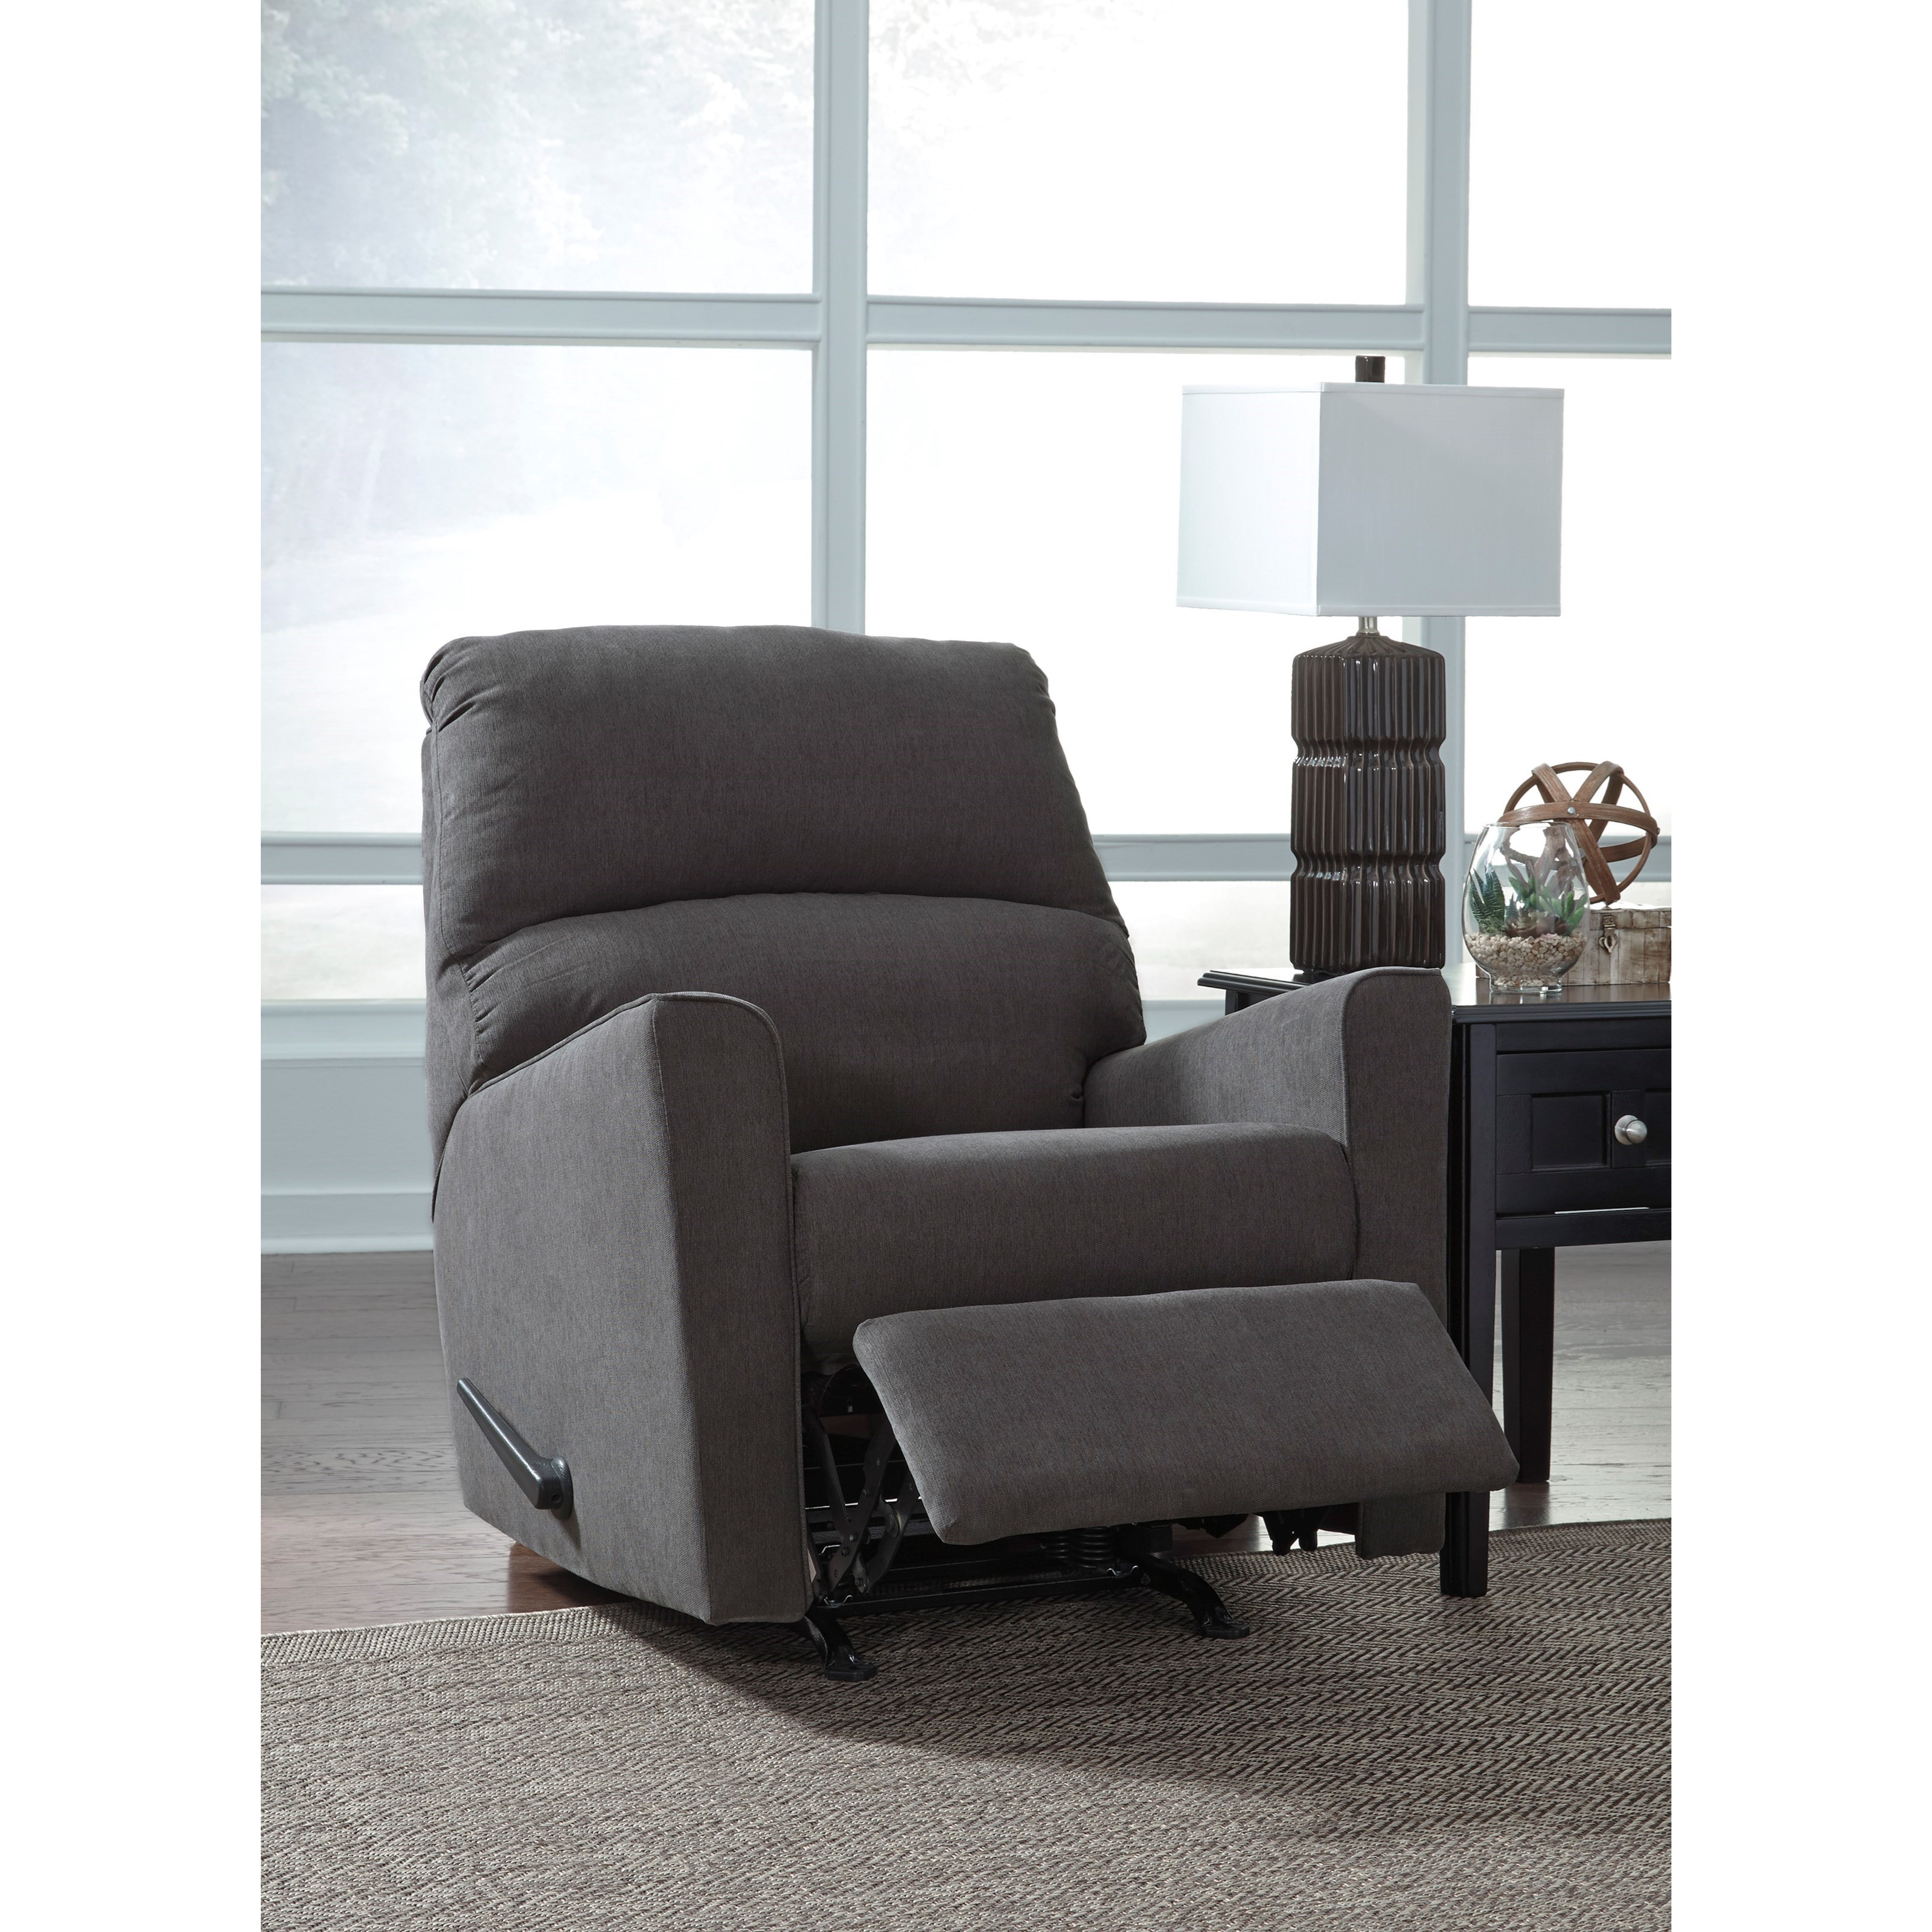 Ashley Furniture Manufacturer: Signature Design By Ashley Alenya